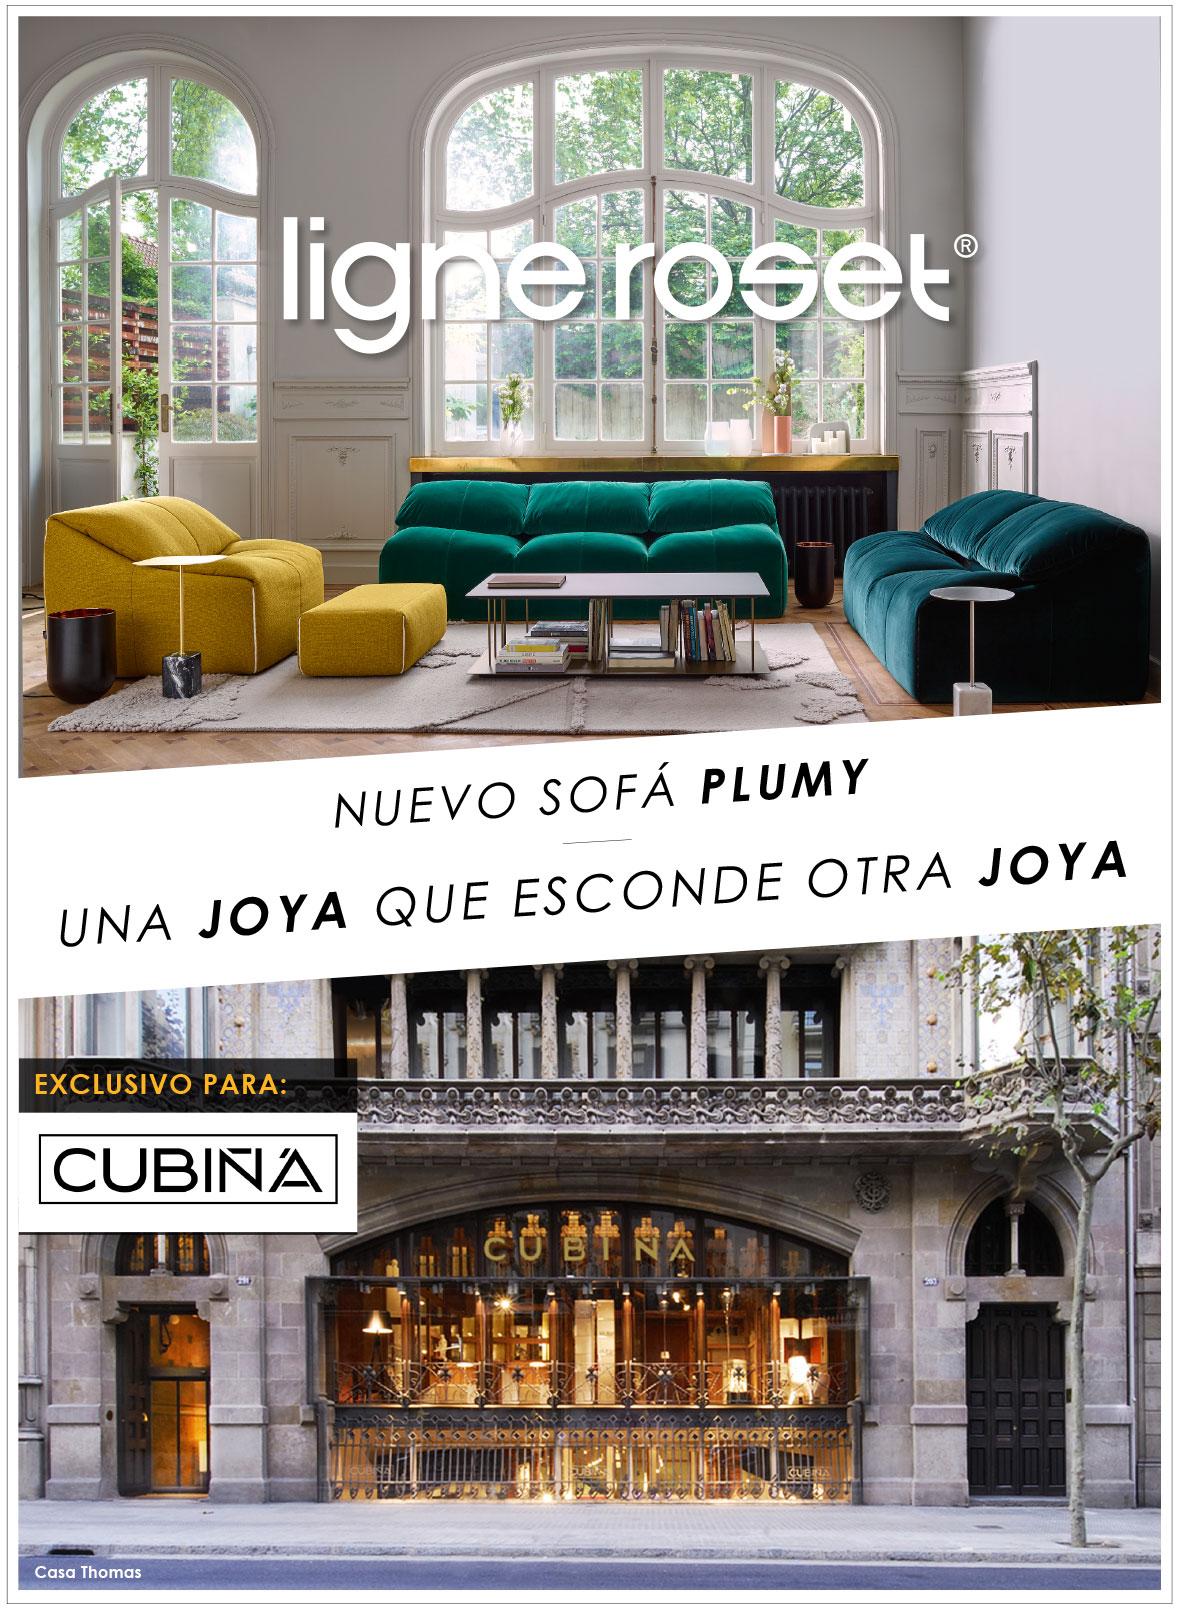 Arquitectura construcci n y dise o la vanguardia - Cubina barcelona ...